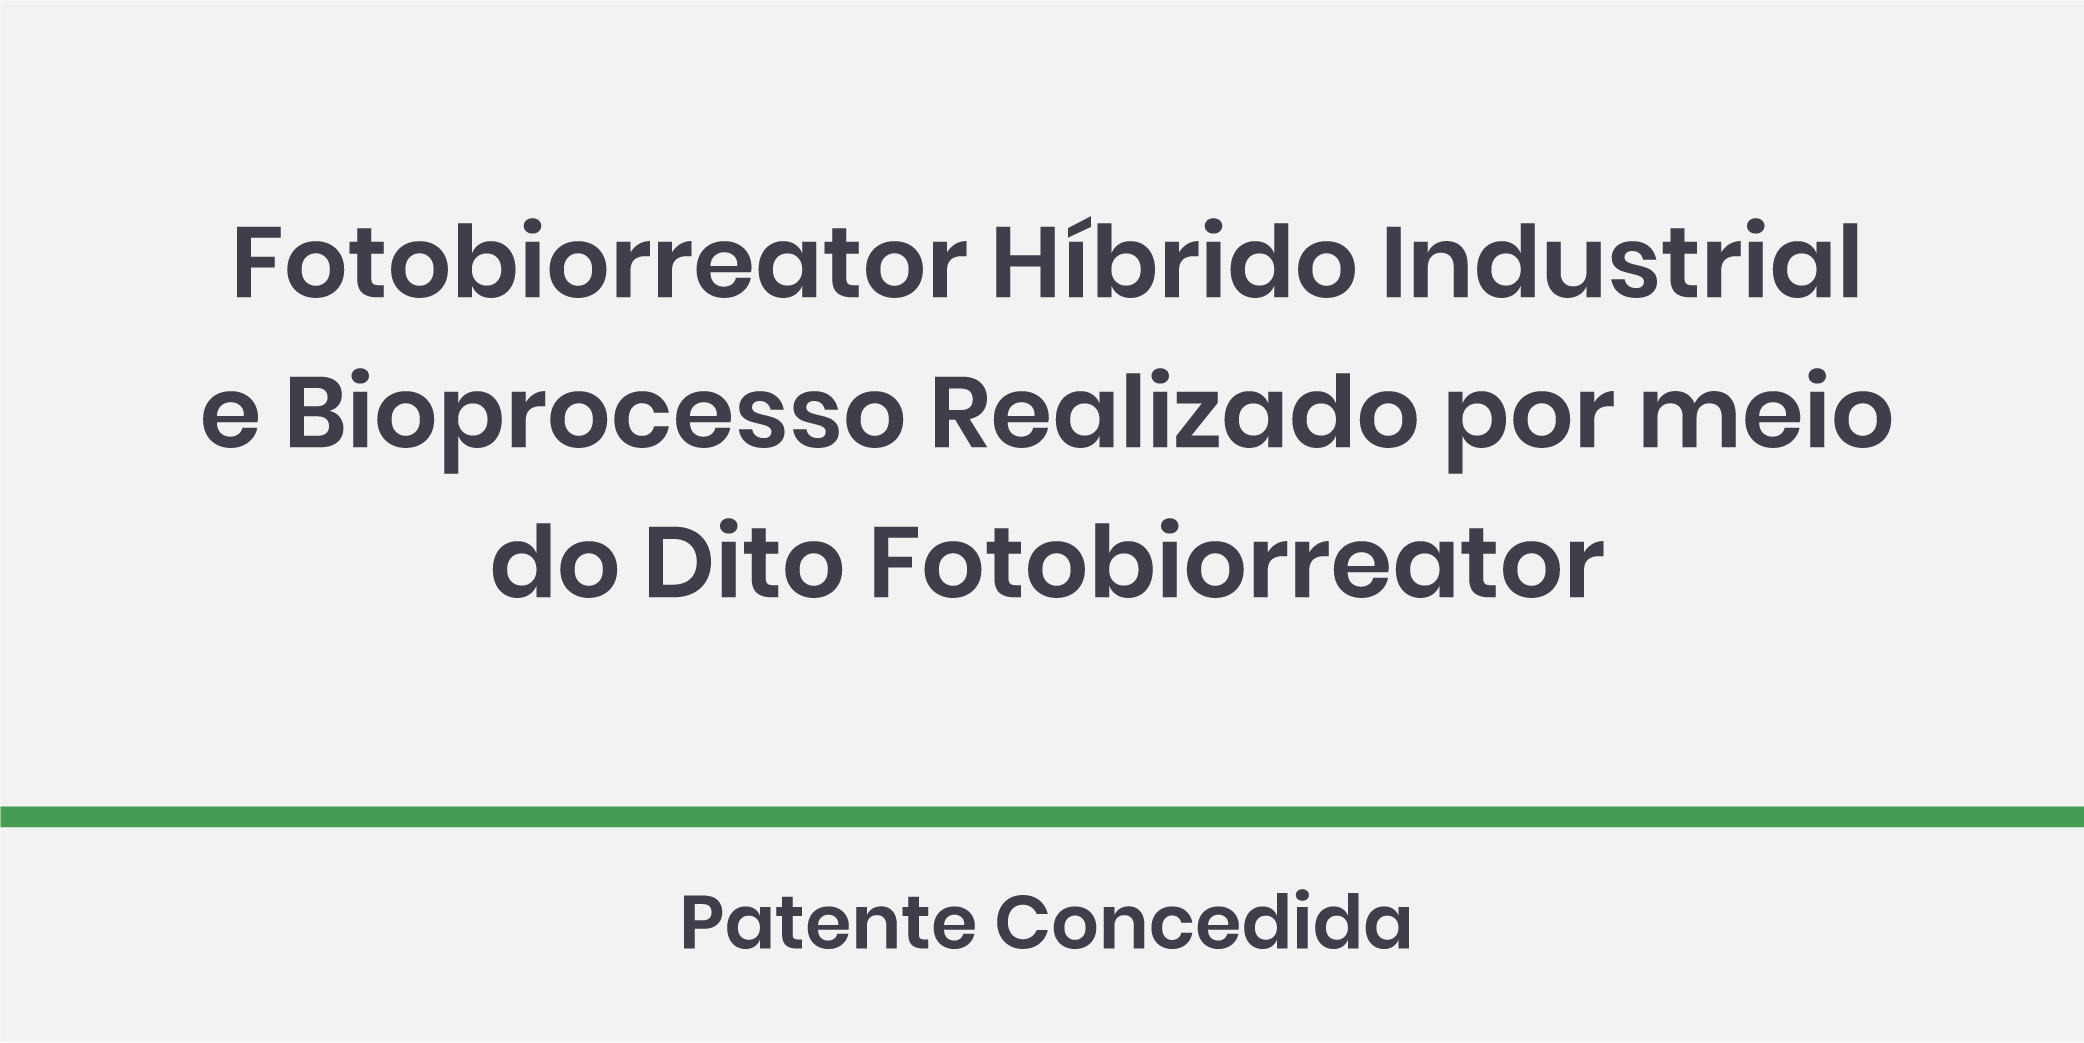 Fotobiorreator Híbrido Industrial e Bioprocesso Realizado por Meio do Dito Fotobiorreator; Patente Concedida